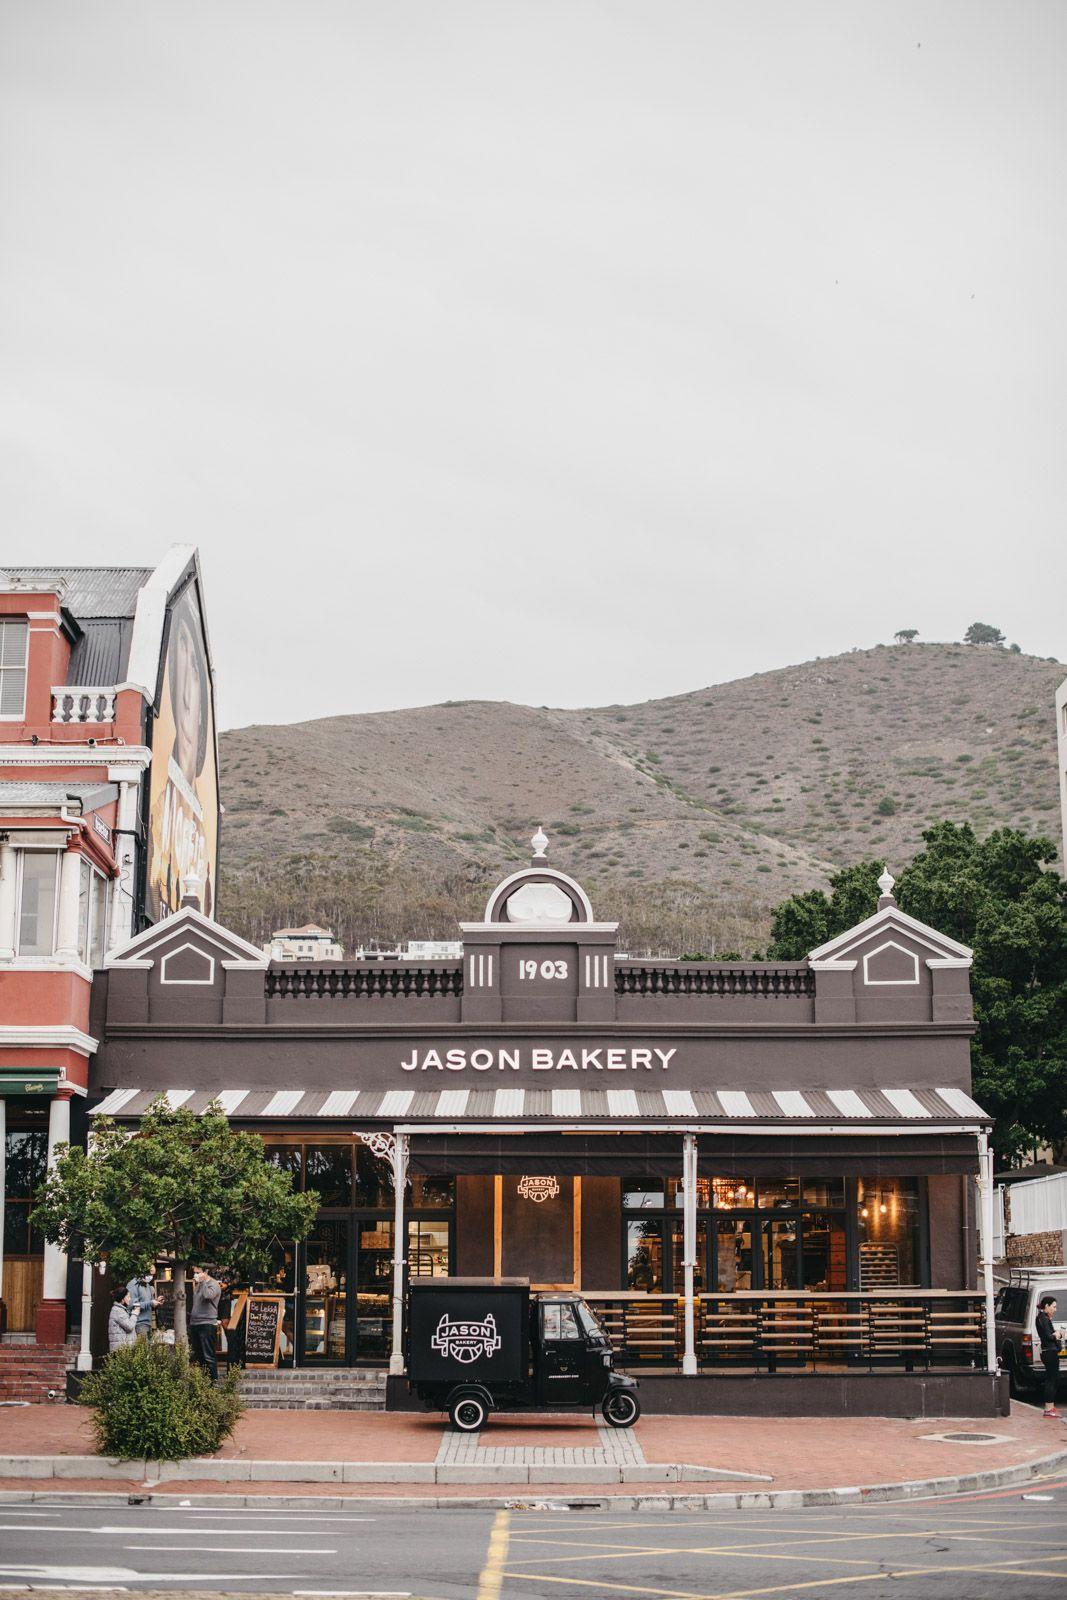 Jason bakery closes bakery bakery website open image